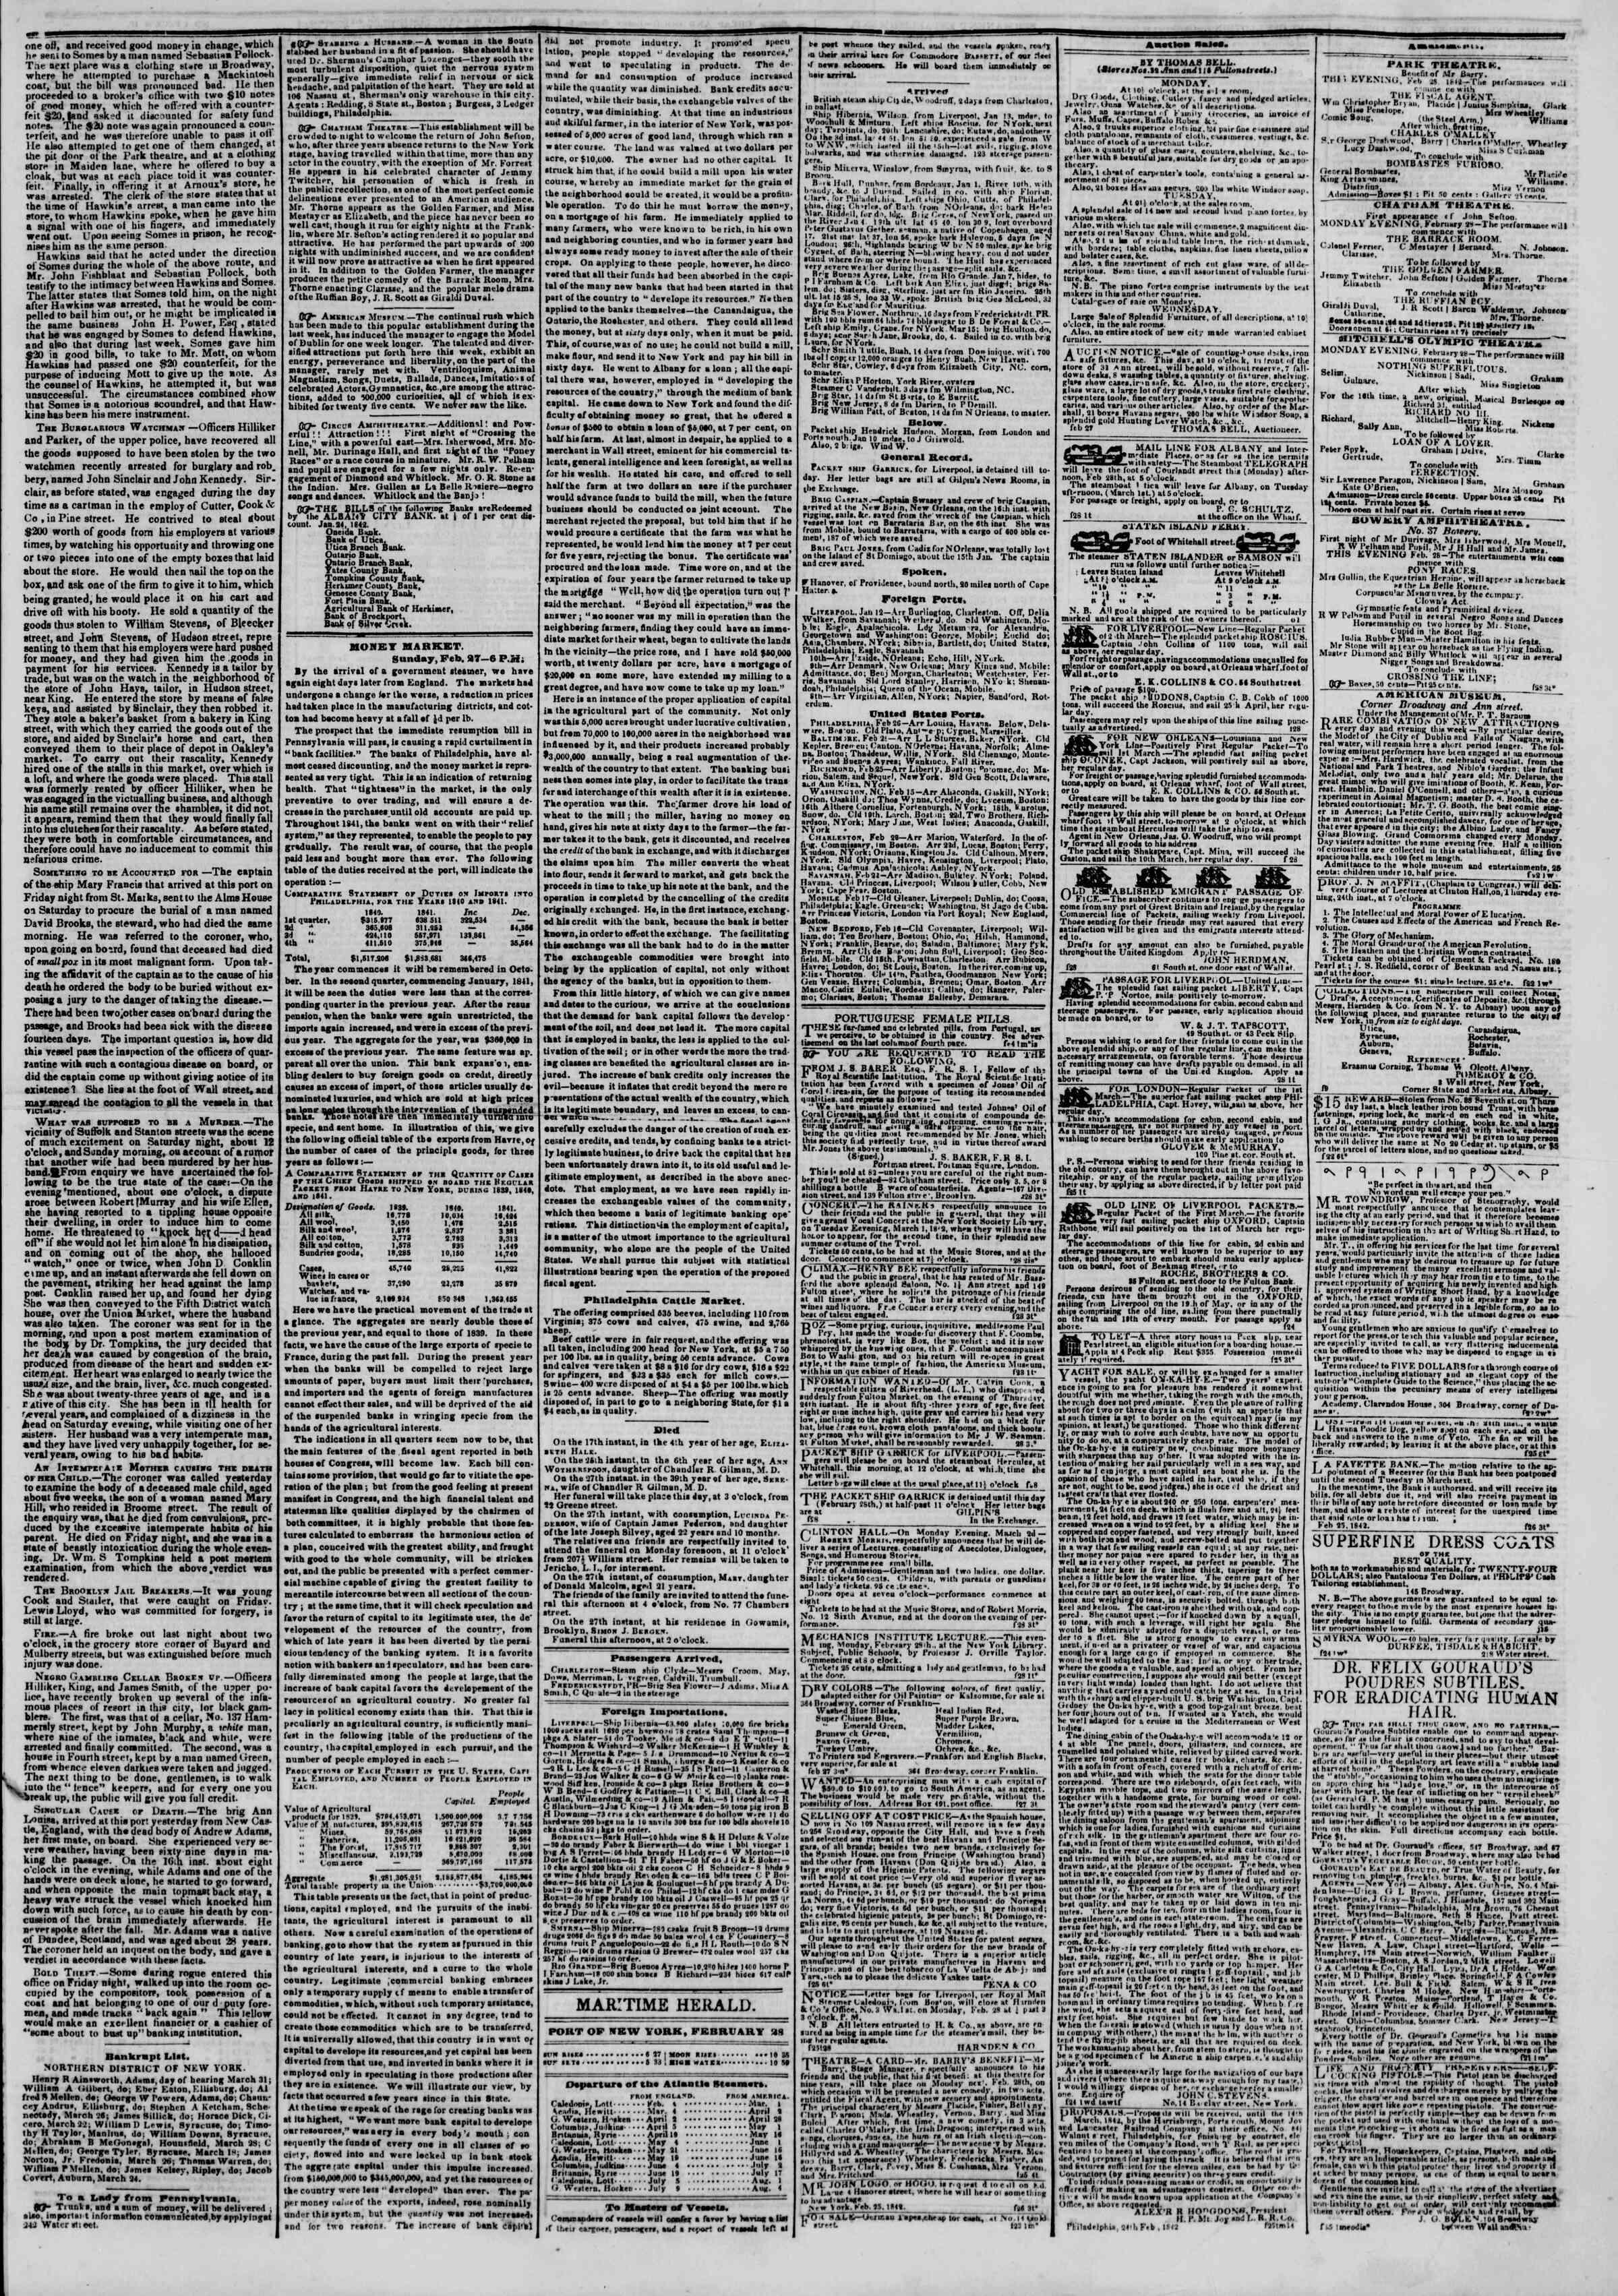 February 28, 1842 Tarihli The New York Herald Gazetesi Sayfa 3